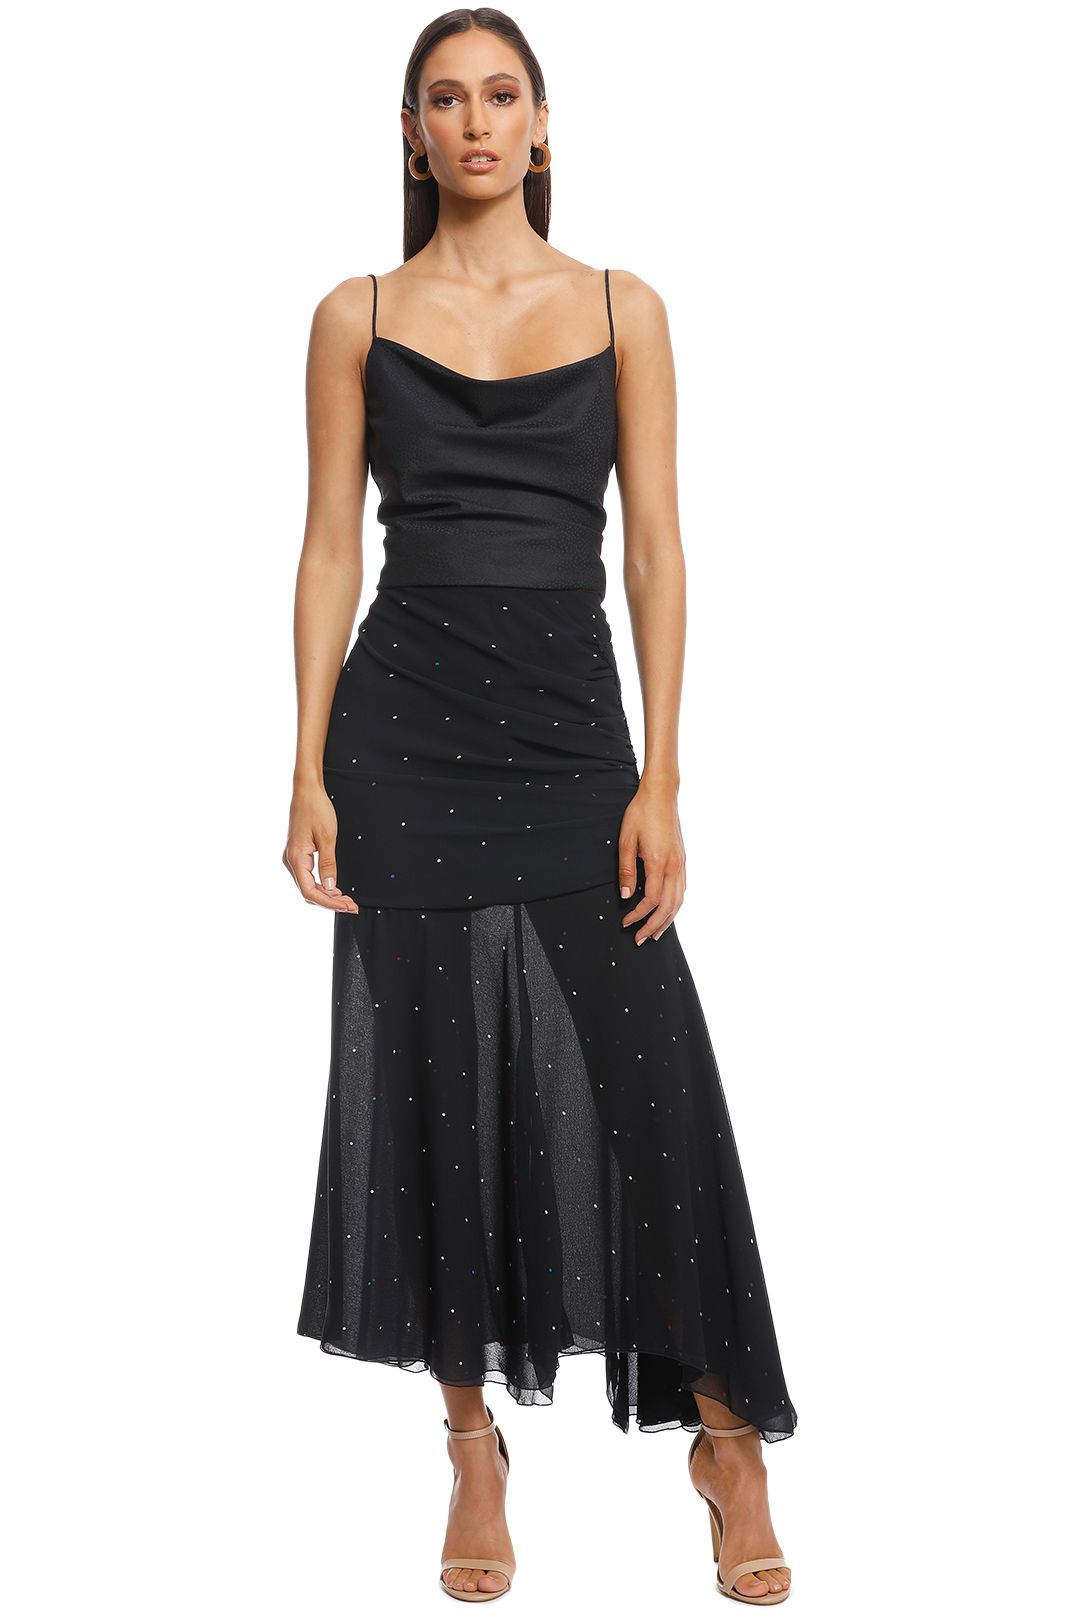 Camilla and Marc - Scarlett Skirt - Black - Front